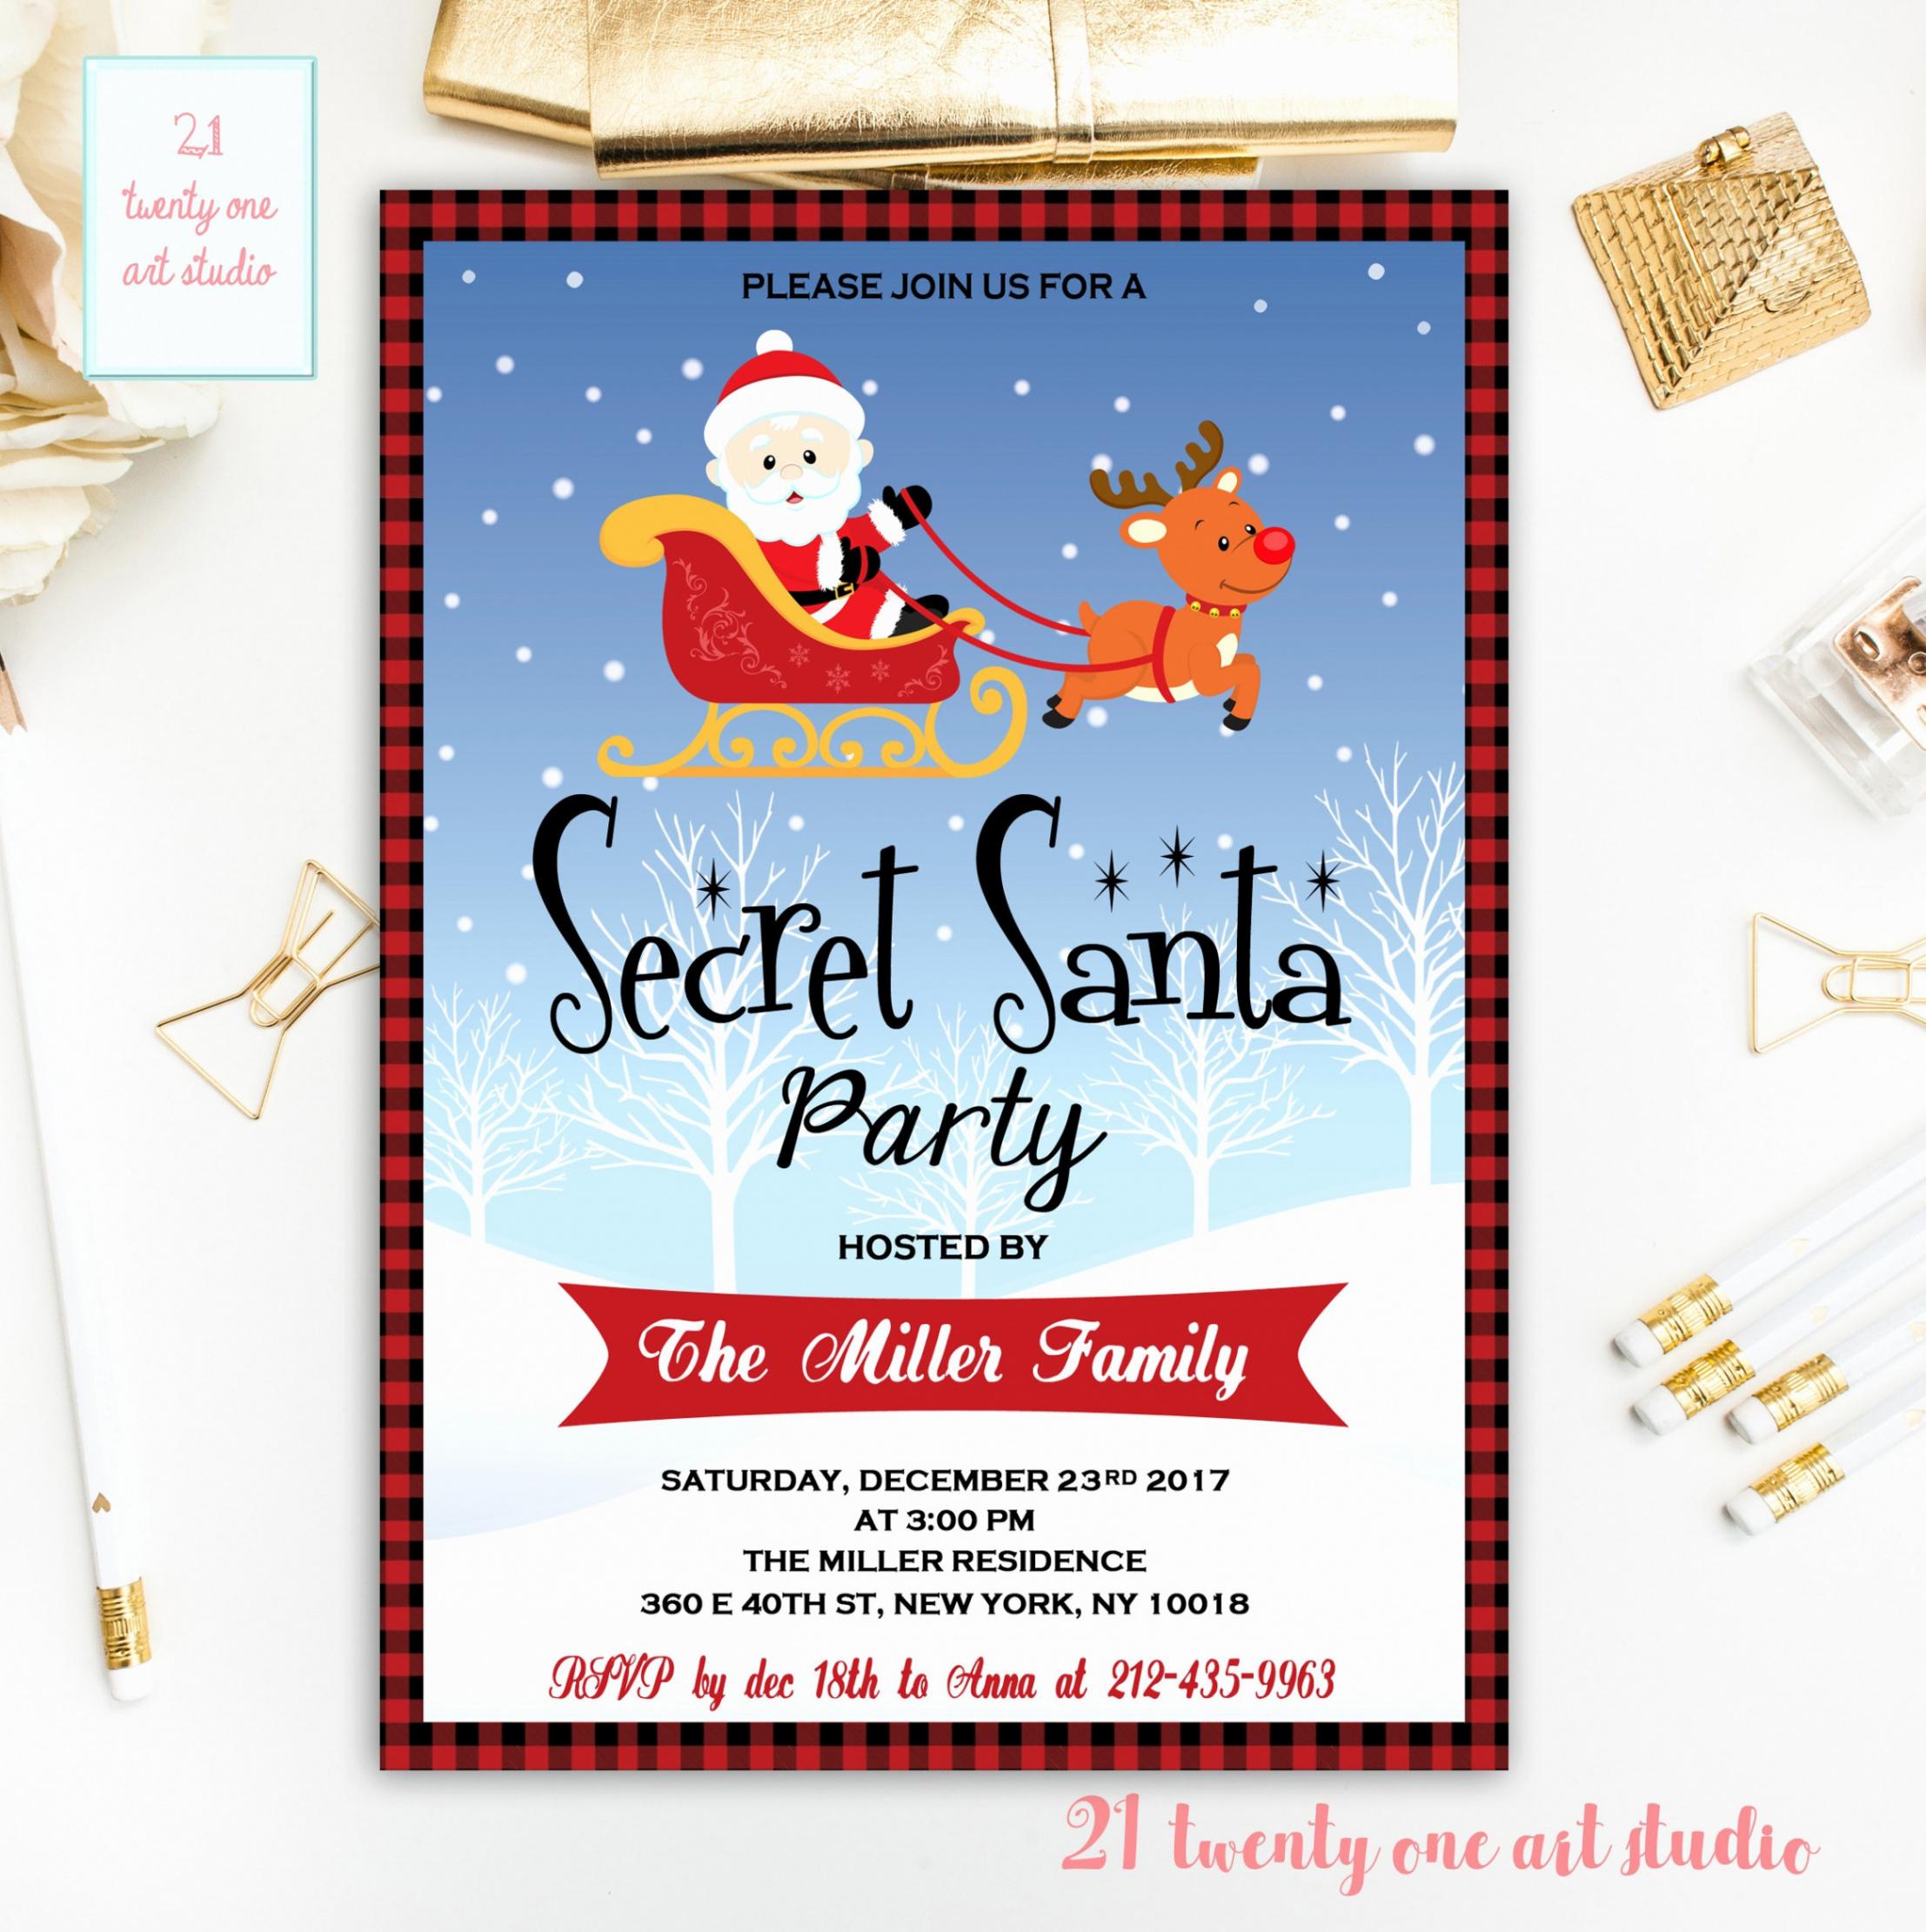 Free Printable 70Th Birthday Party Invitations Luxury Free Printable - Free Printable 70Th Birthday Party Invitations